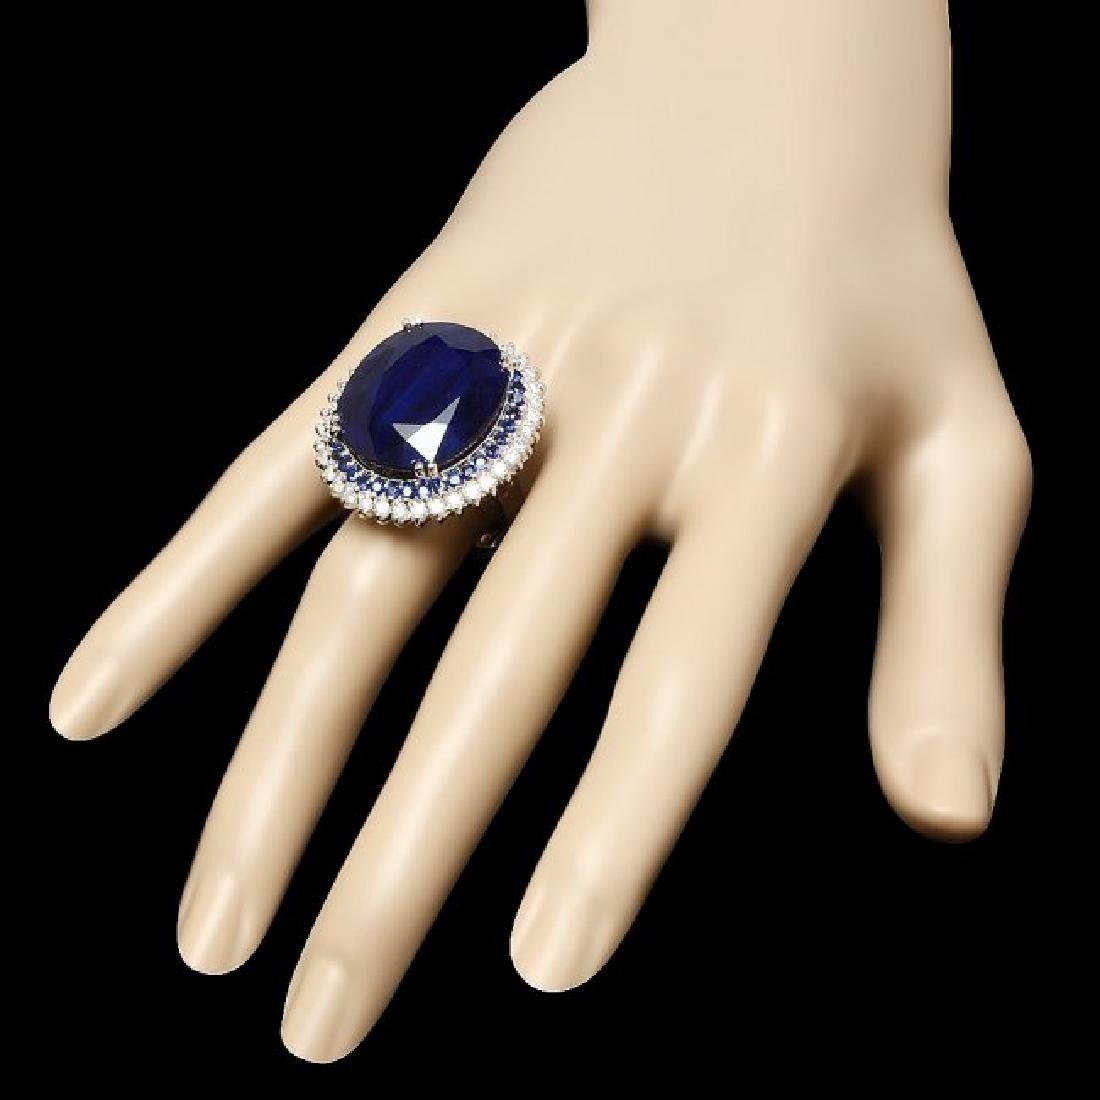 14k Gold 44.4ct Sapphire 1.35ct Diamond Ring - 3